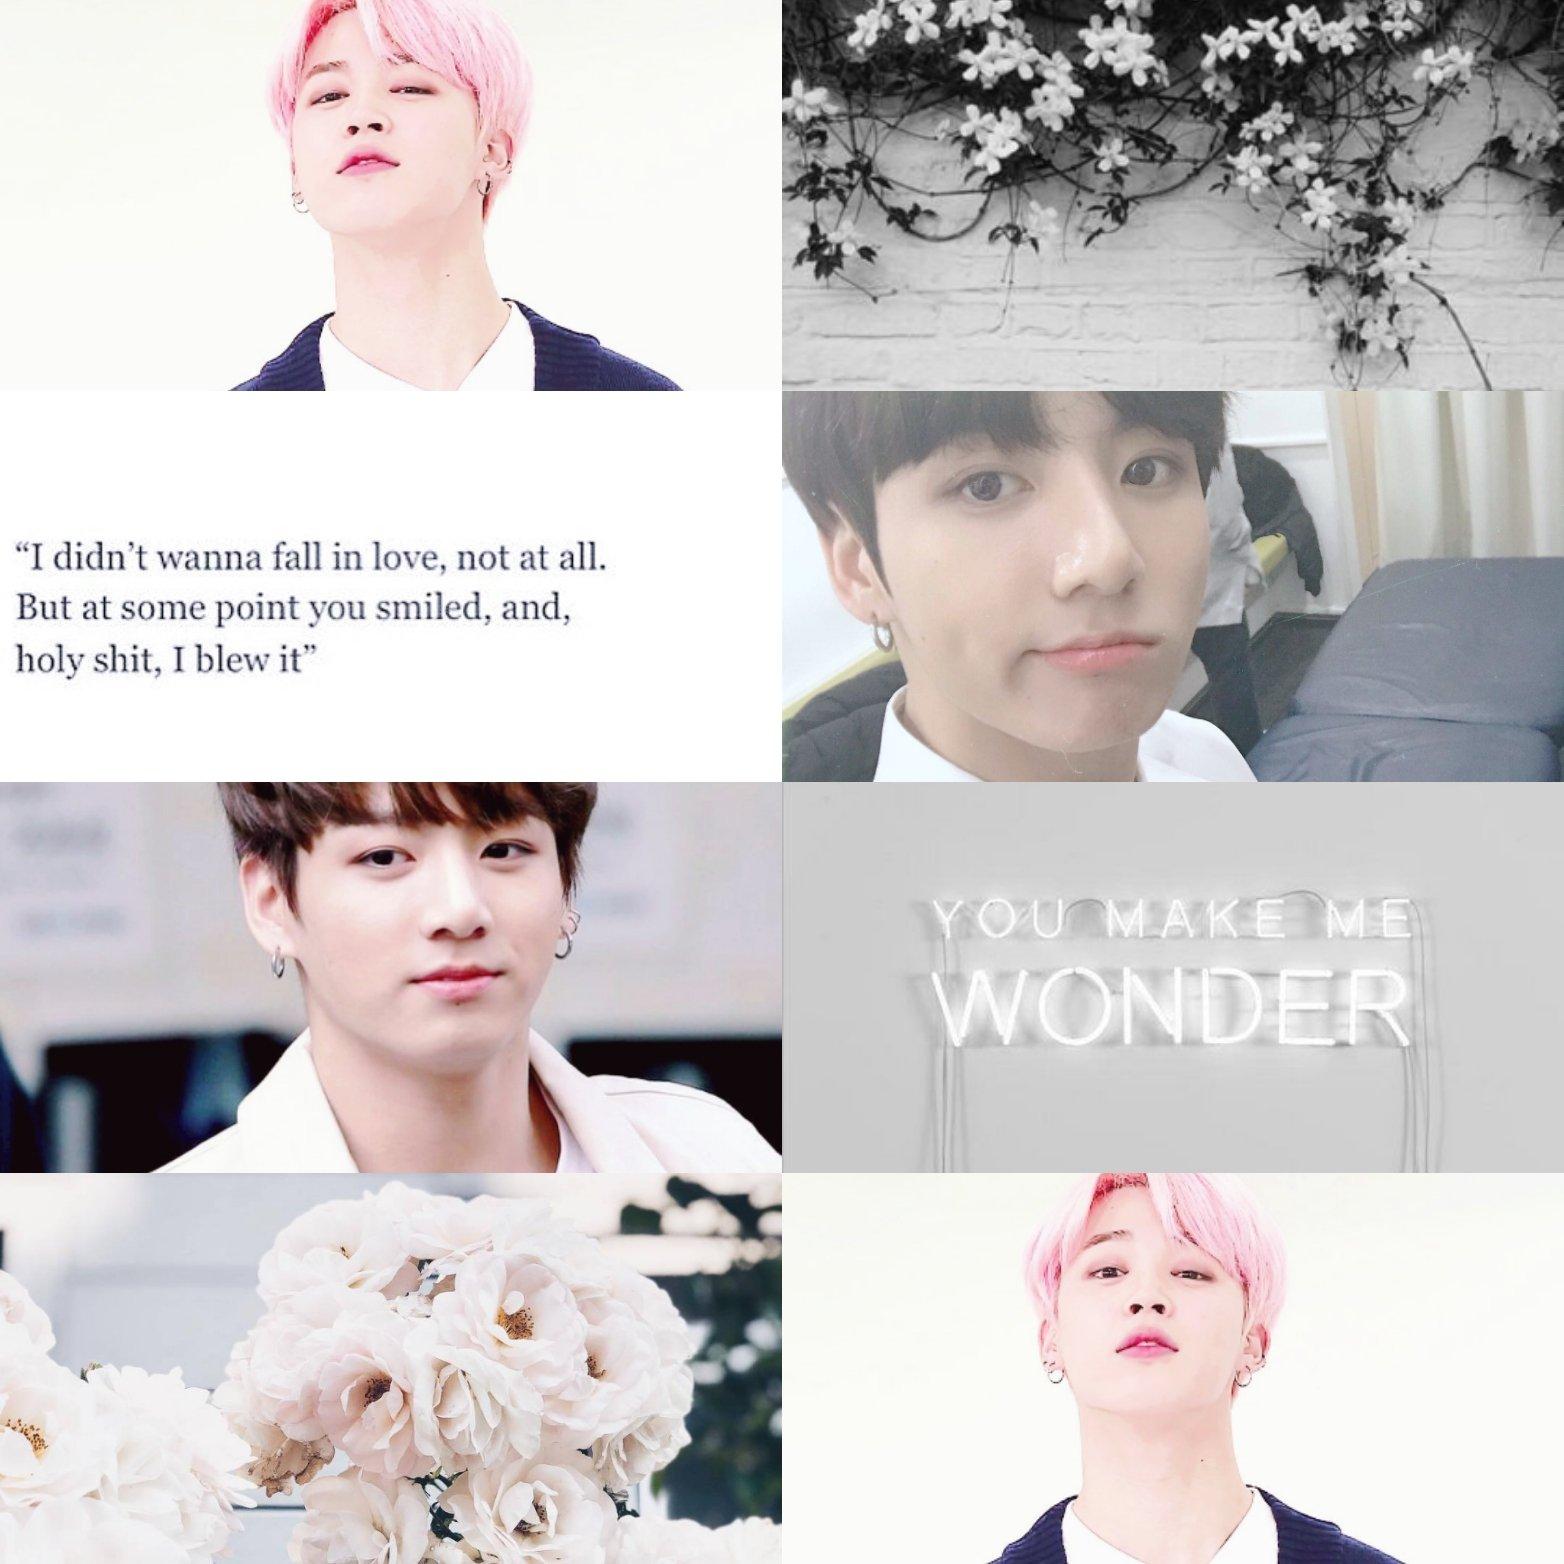 If I Ever See You Again - Chapter 1 - Heal3r - 방탄소년단 | Bangtan